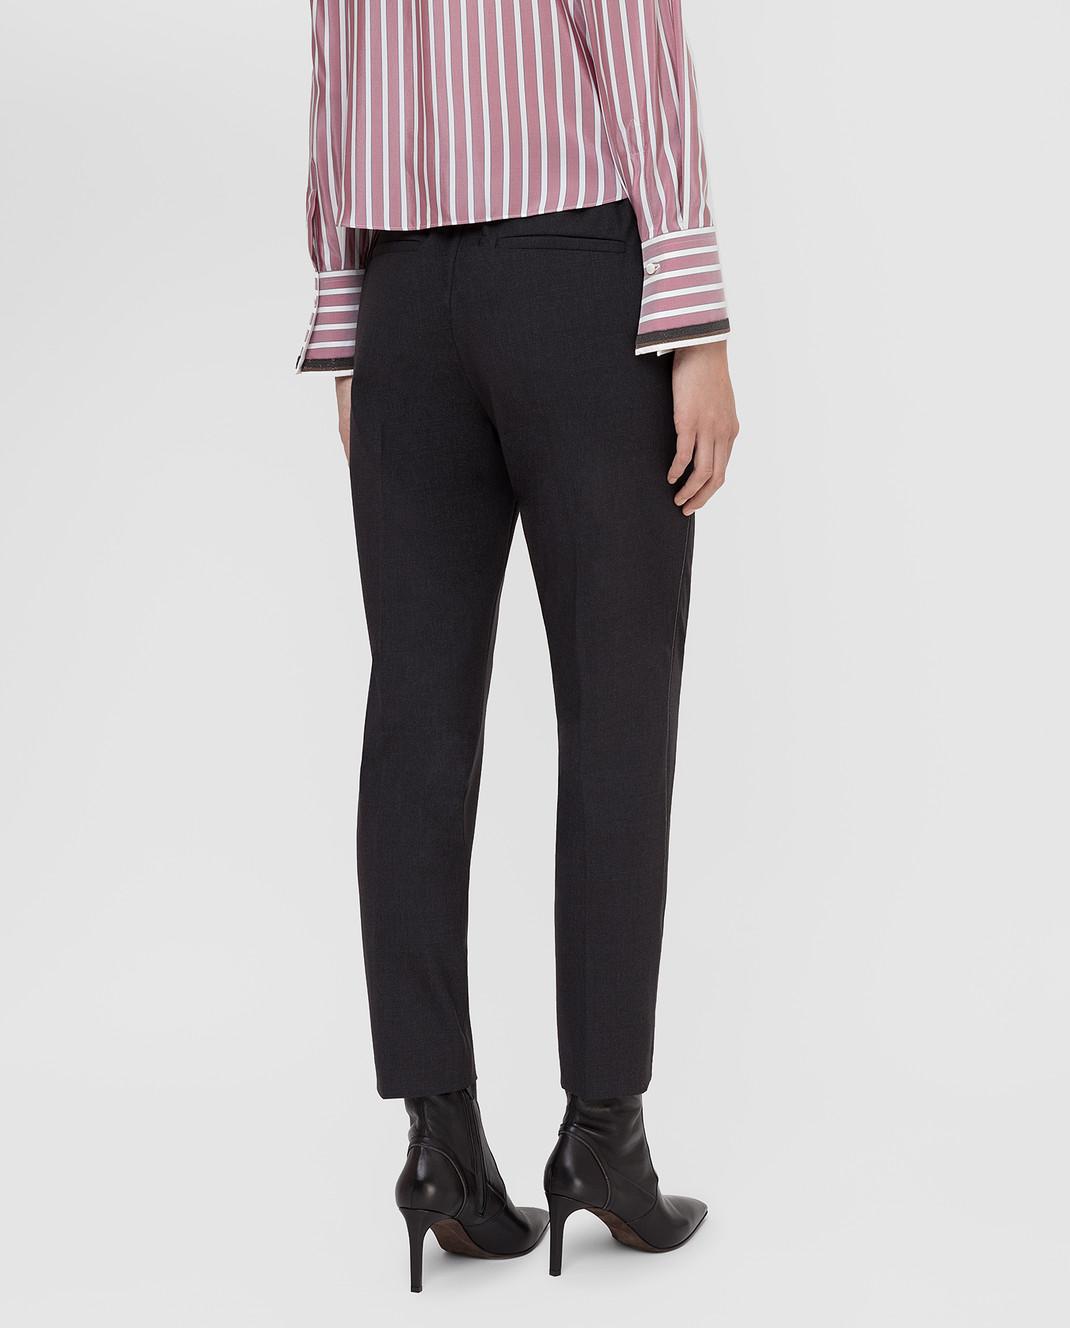 Brunello Cucinelli Темно-серые брюки из шерсти M0W07P6818 изображение 4